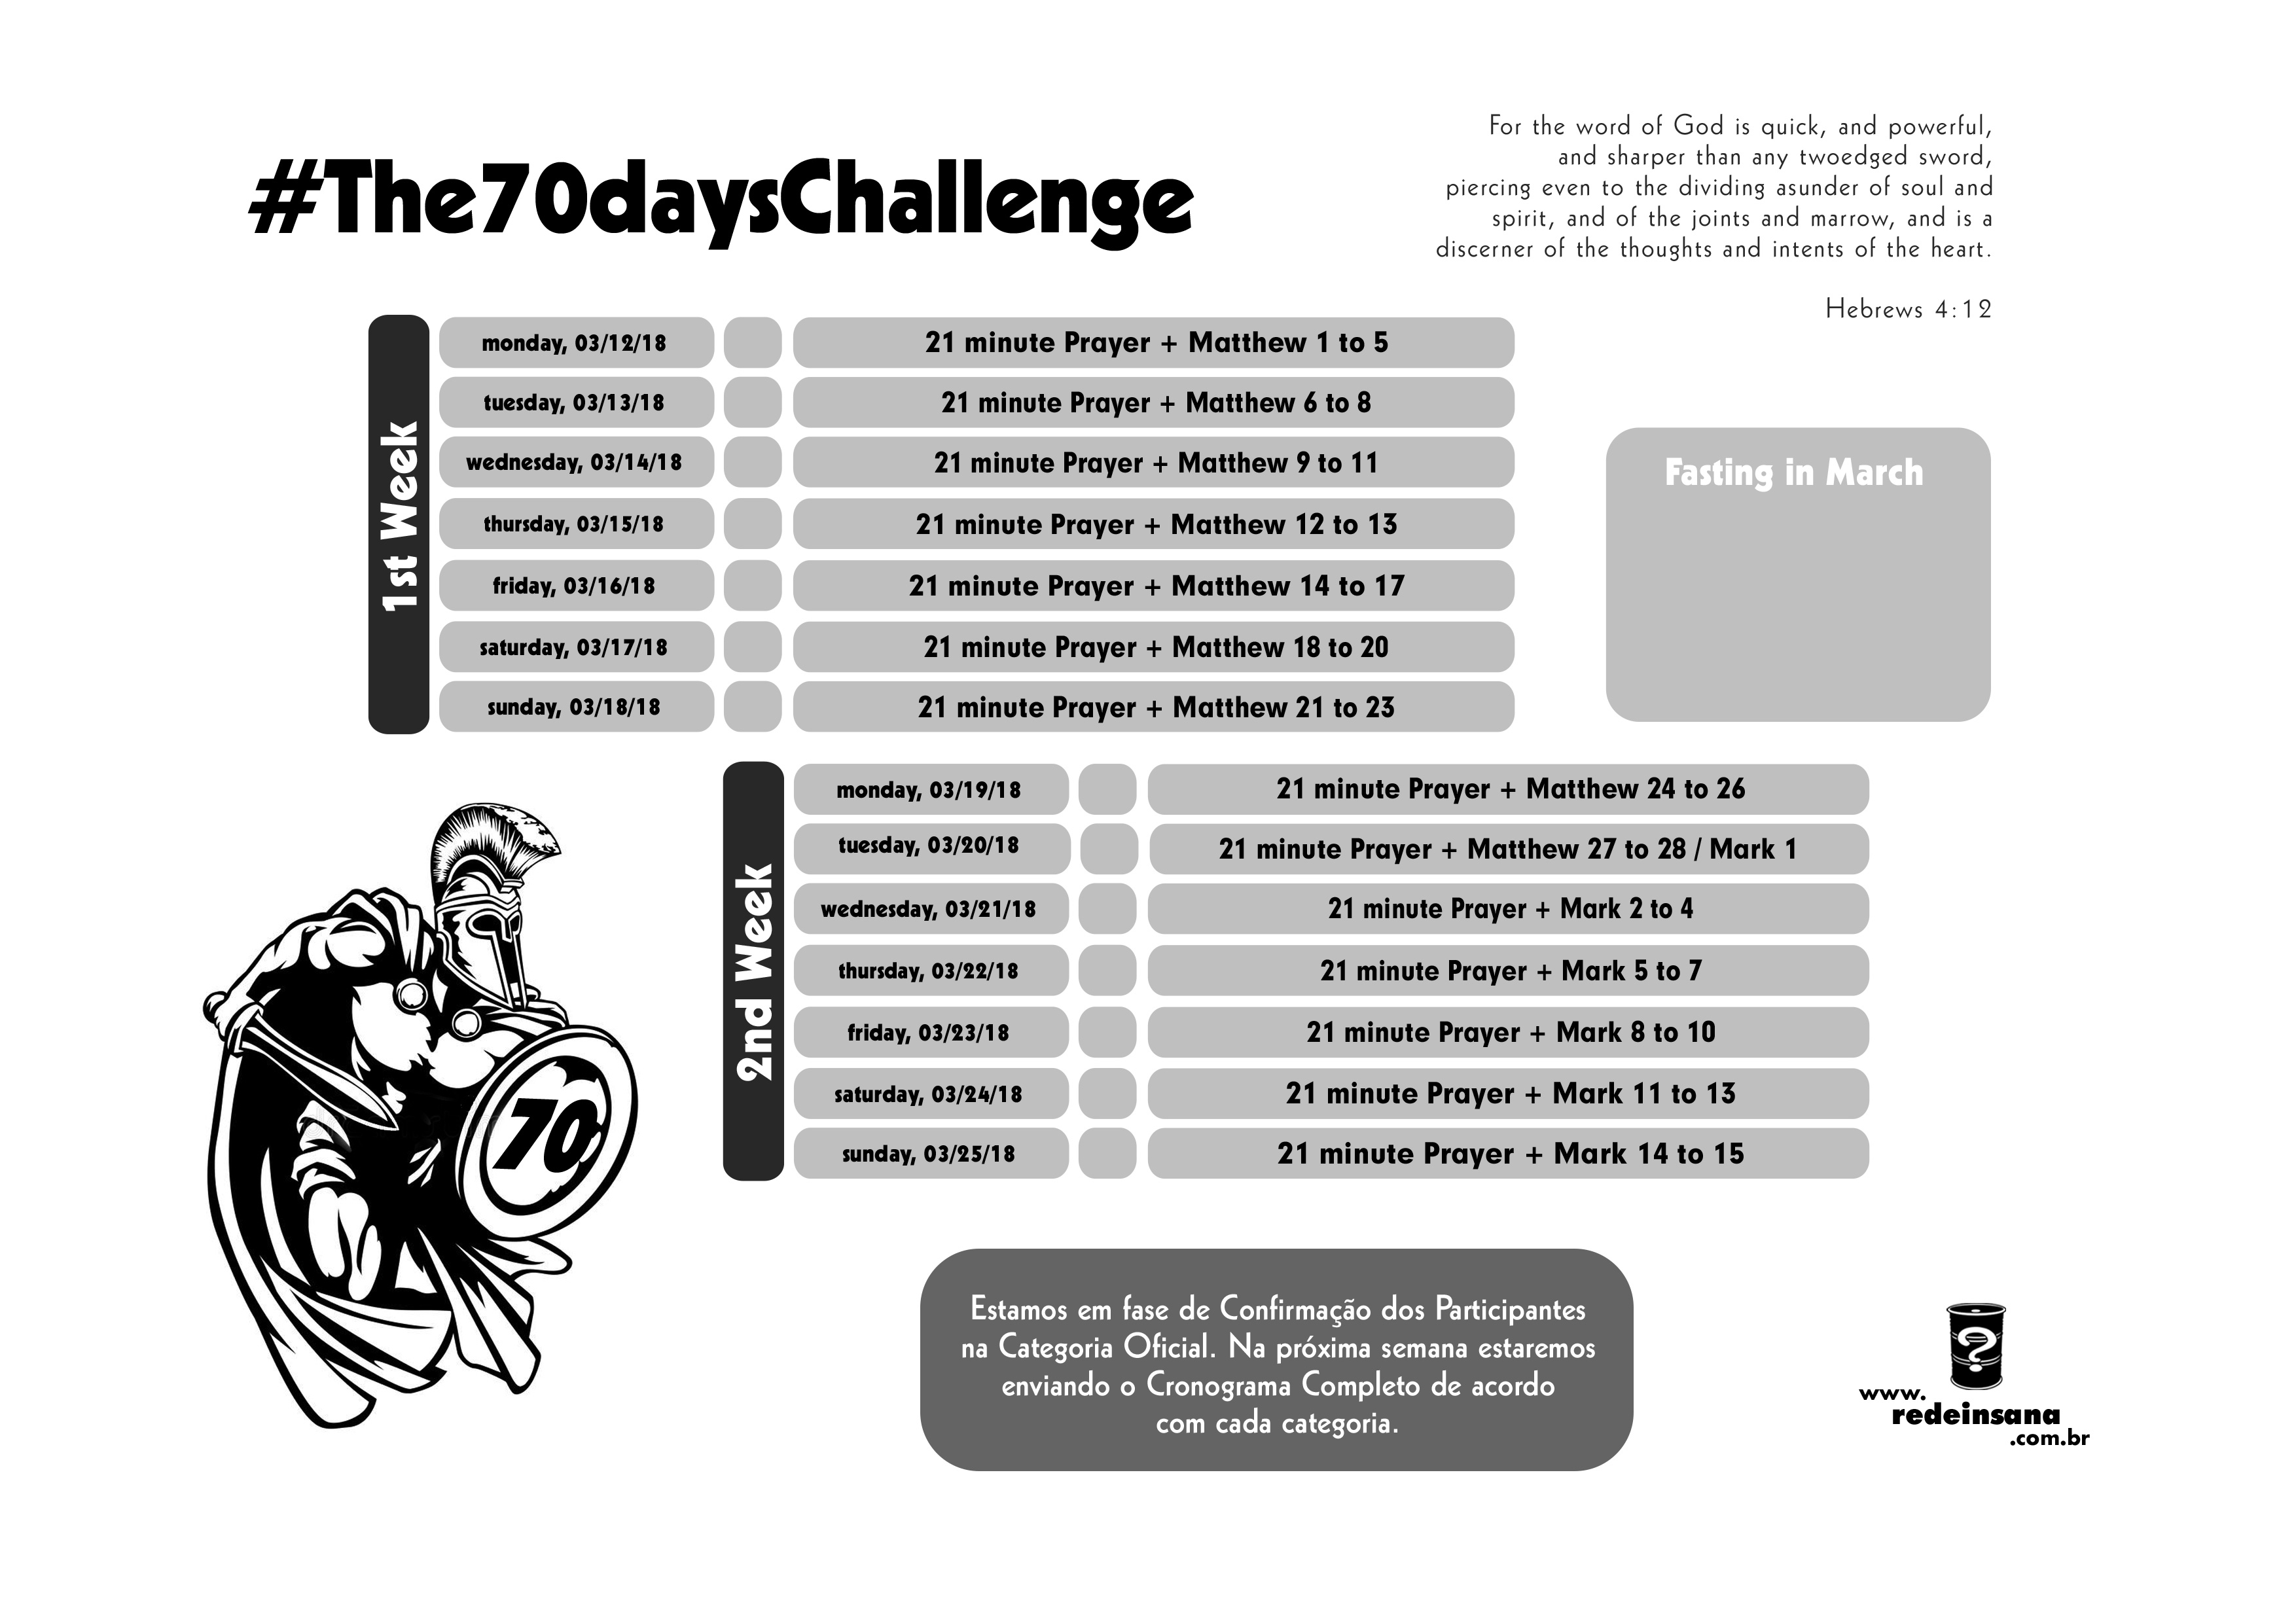 Cronograma The 70 days Challenge